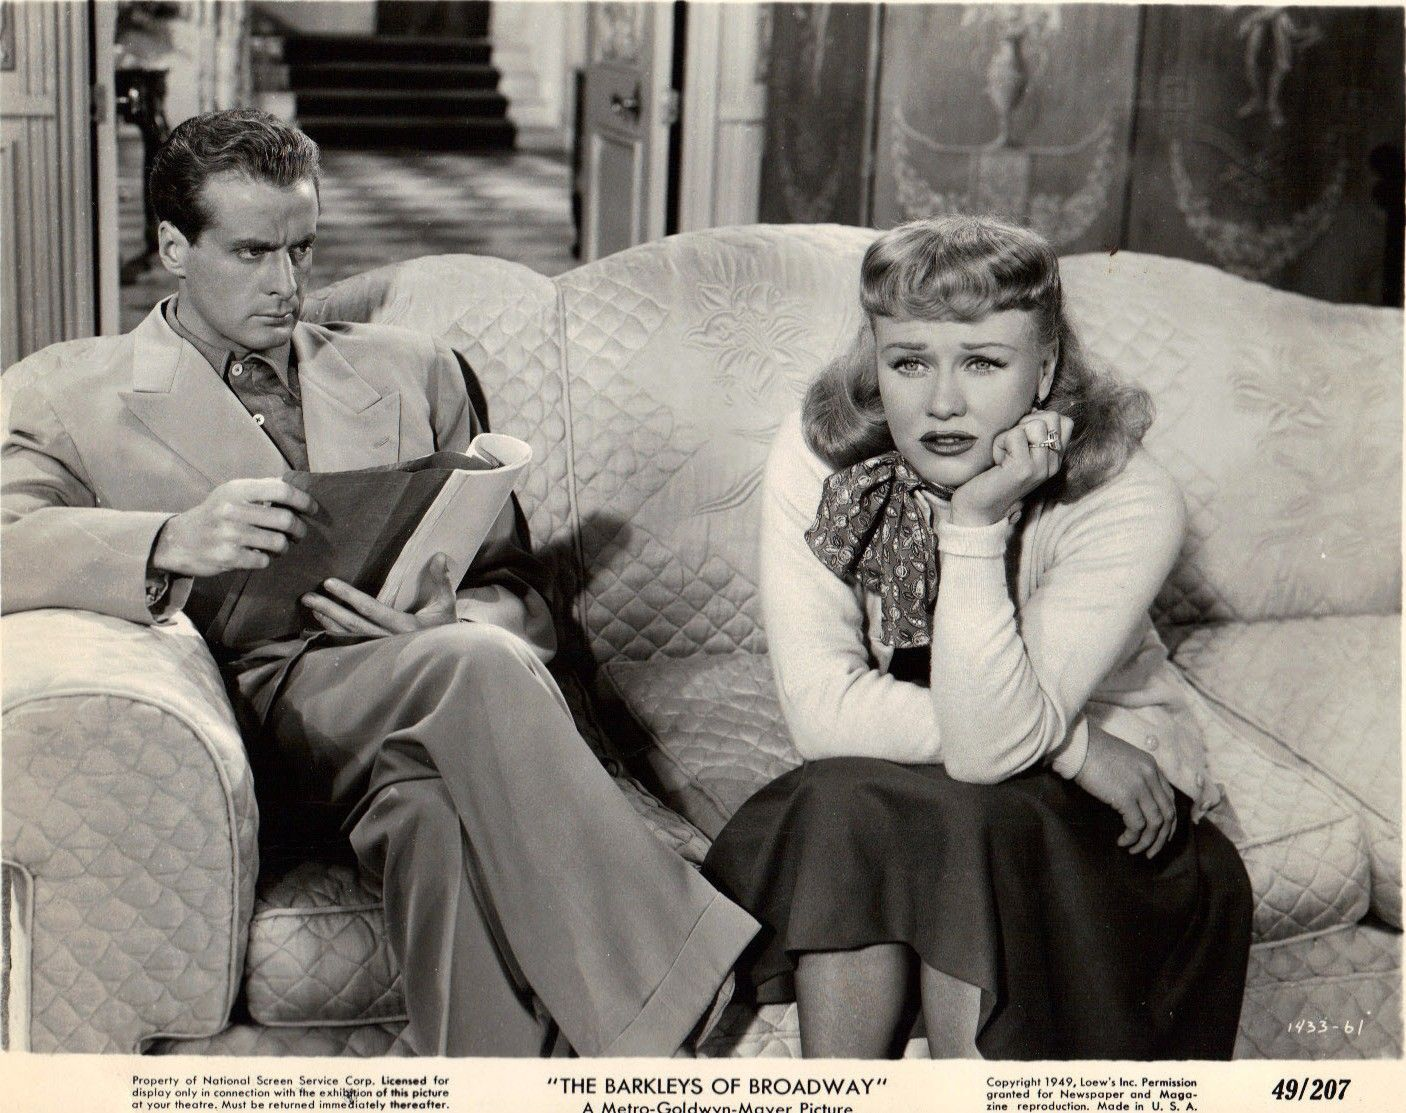 Ginger Rogers The Barkleys of Broadway 1949